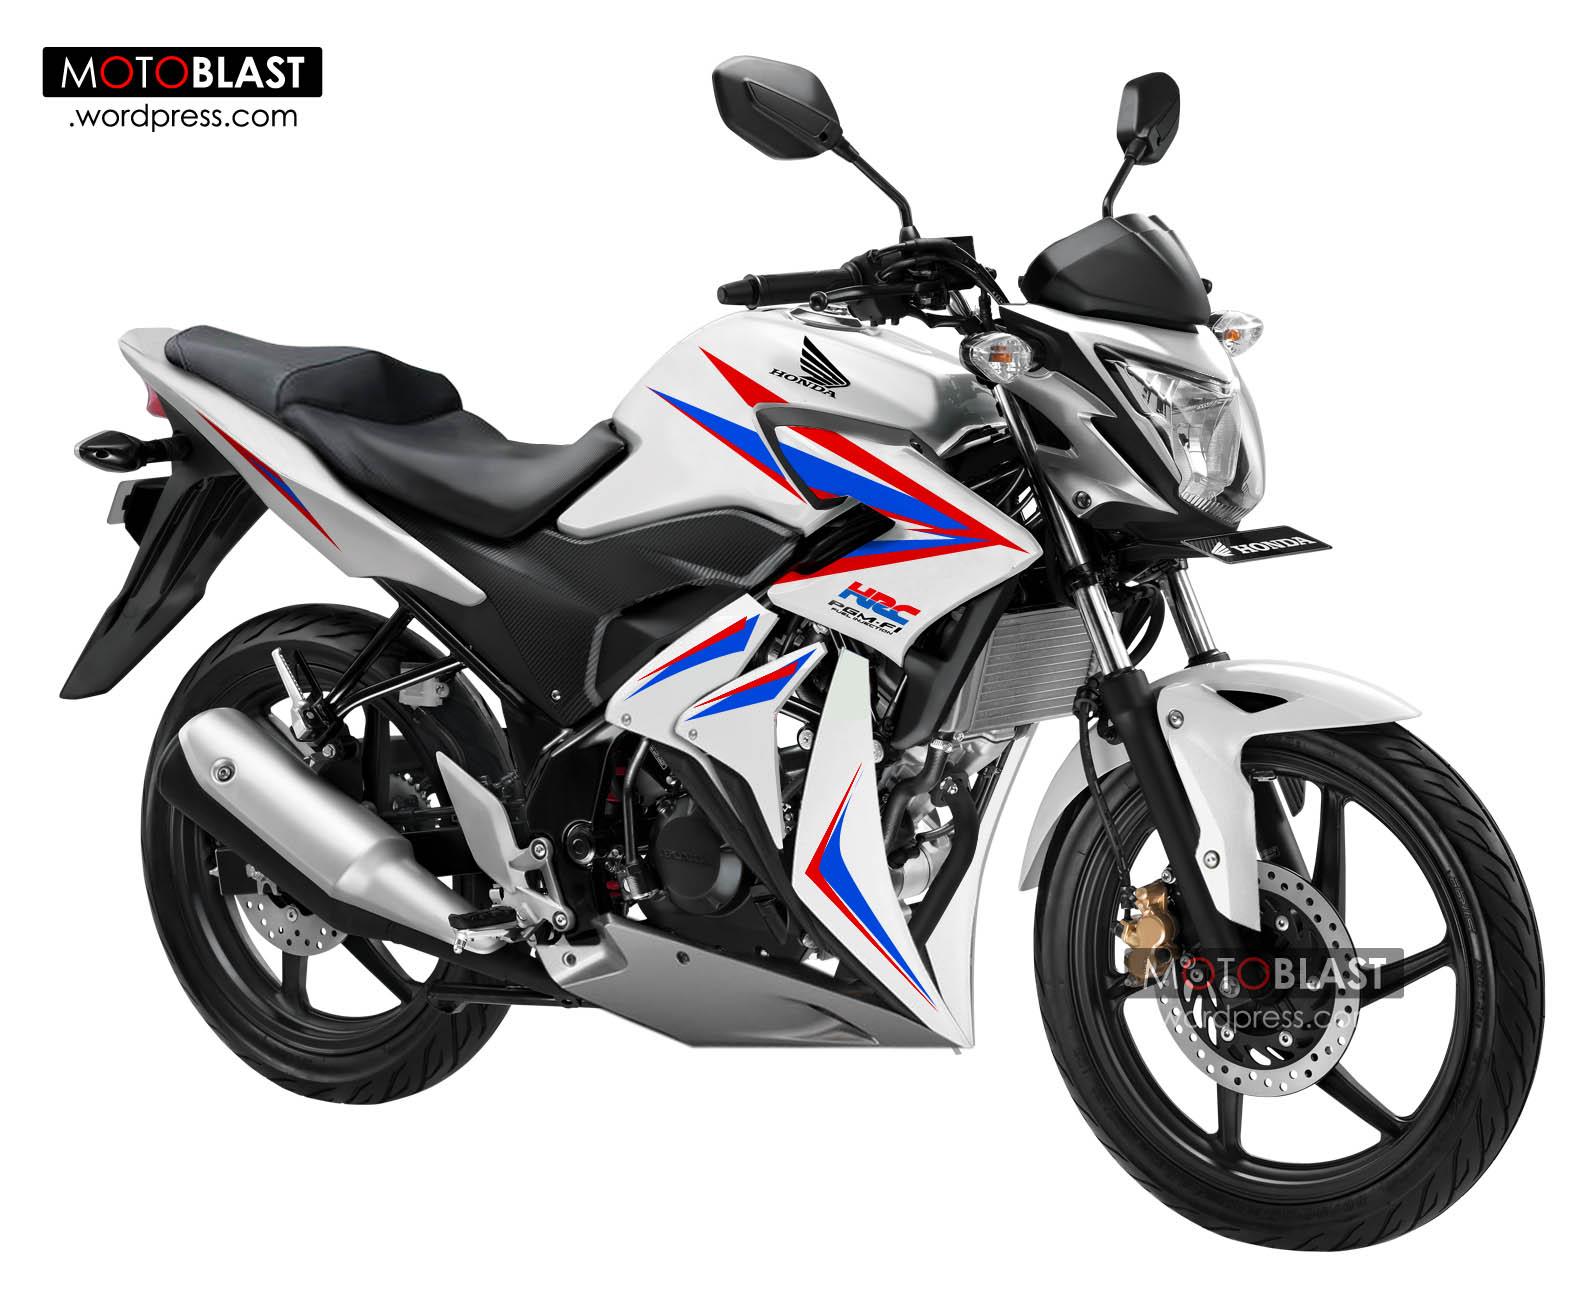 cb150r-white-modif-single-seat-undercowl-dan-half-fairing-striping-fireblade